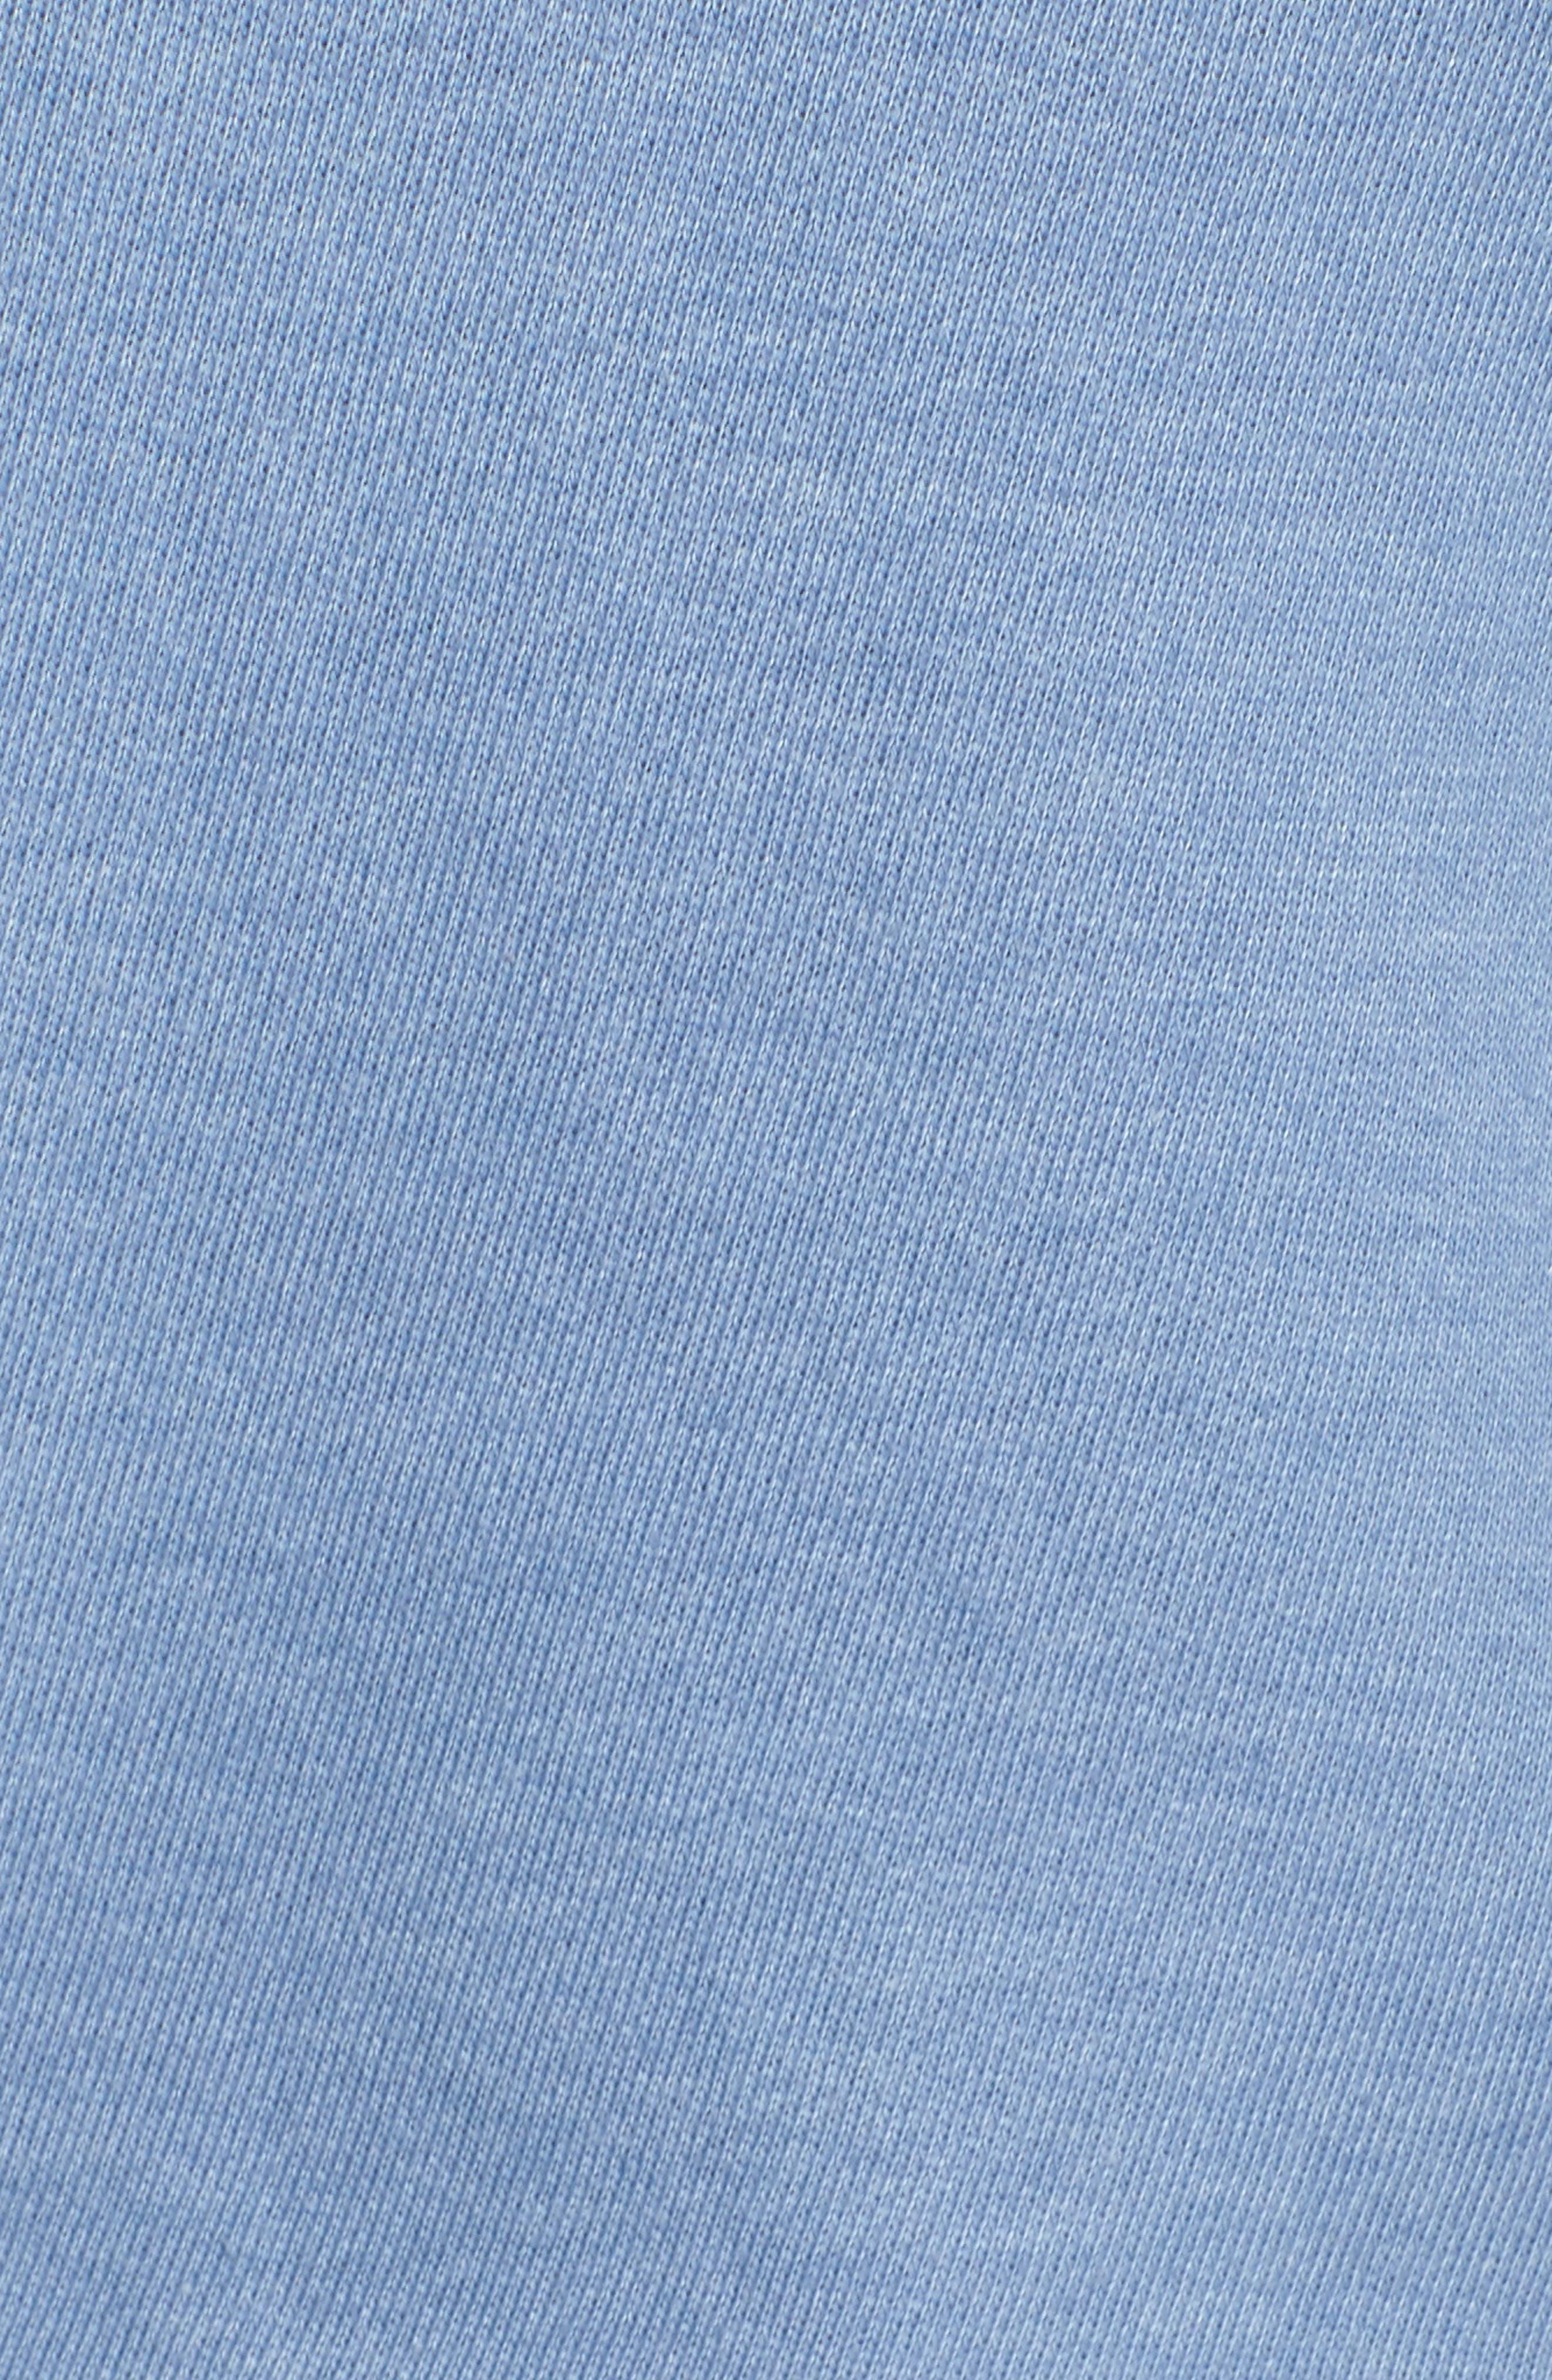 Alternate Image 6  - Junk Food Forever Short Sleeve Sweatshirt (Nordstrom Exclusive)